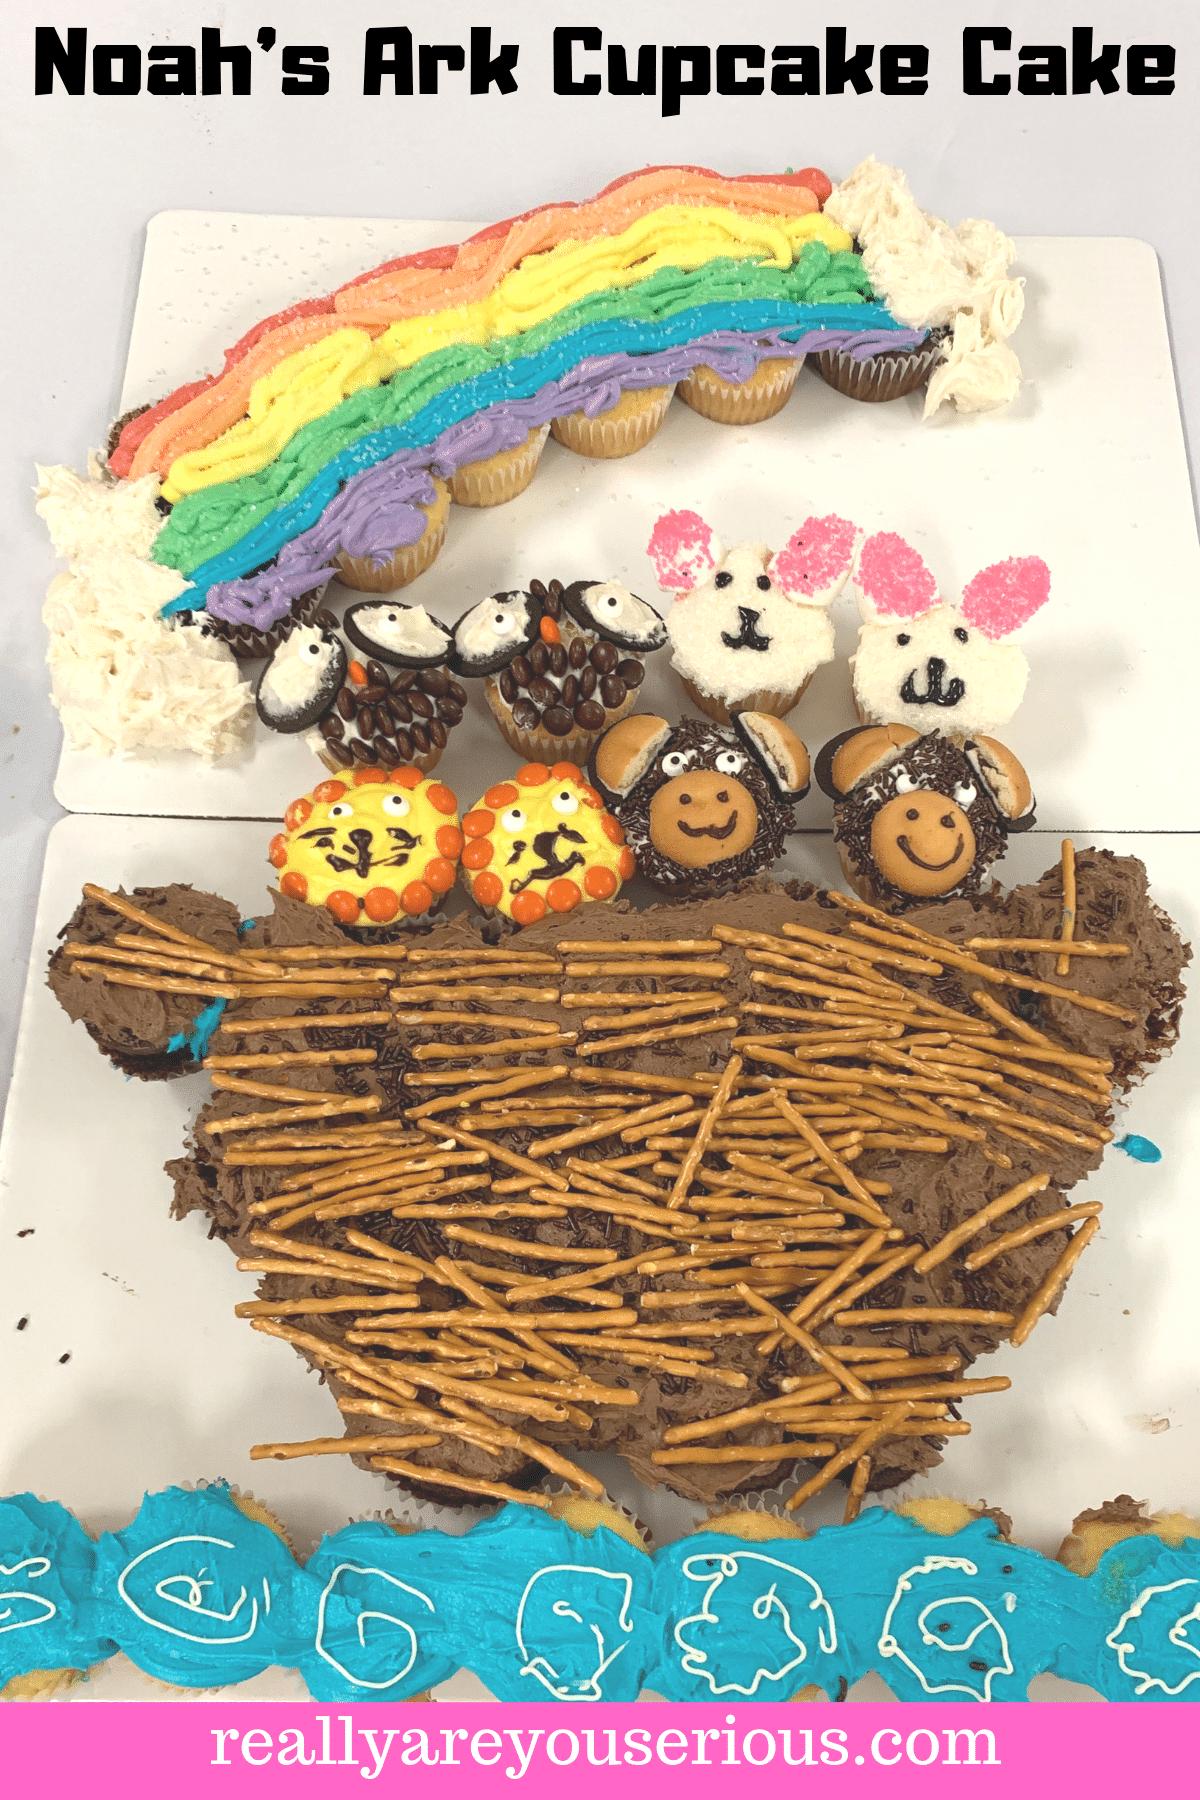 Noahs Ark Cupcake Cake